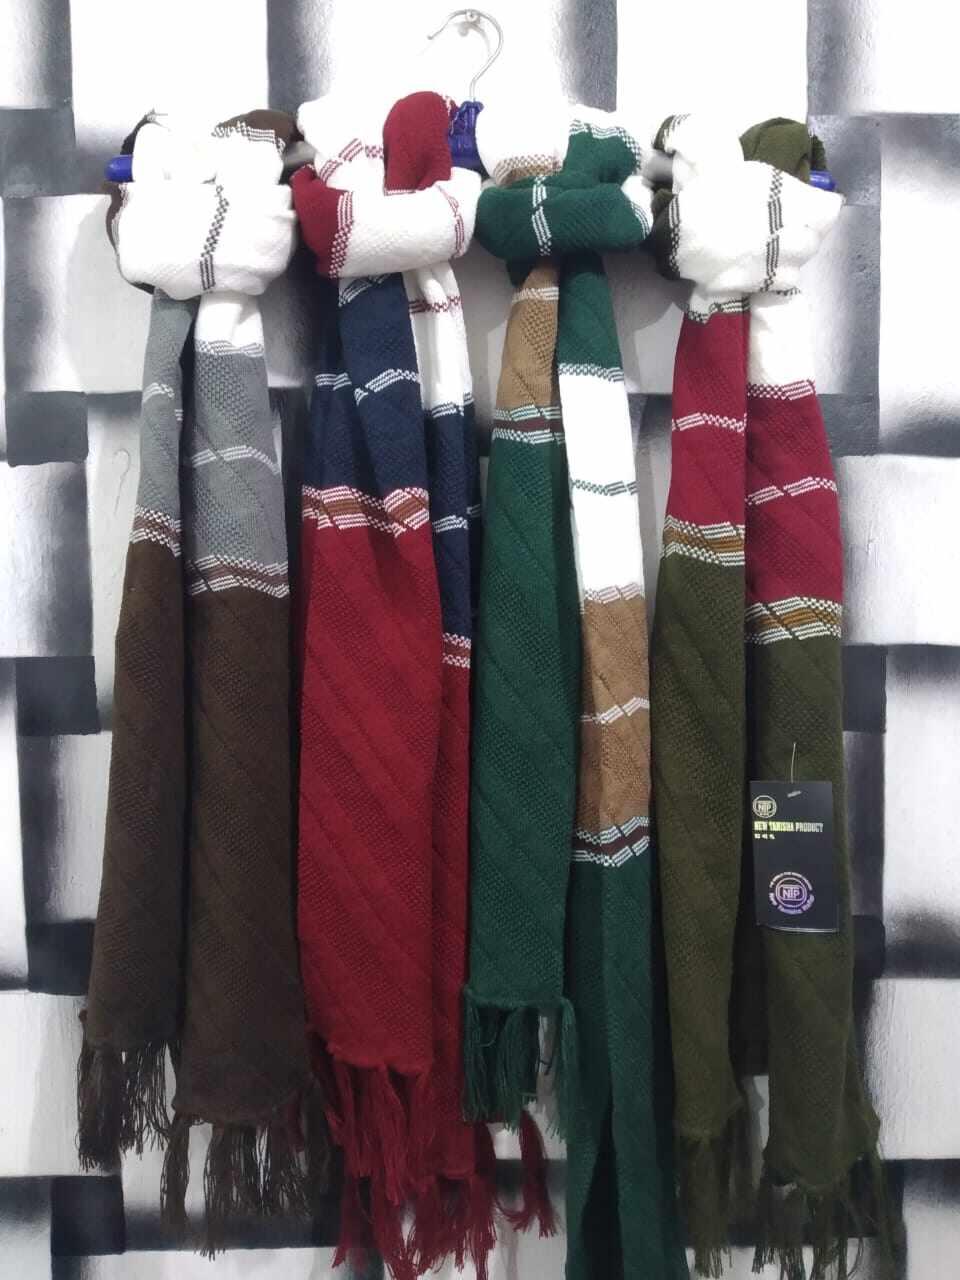 Muffler Men S And Women Woolen Muffler Check Pattern Muffler Buy Online At Best Prices In Bangladesh Daraz Com Bd